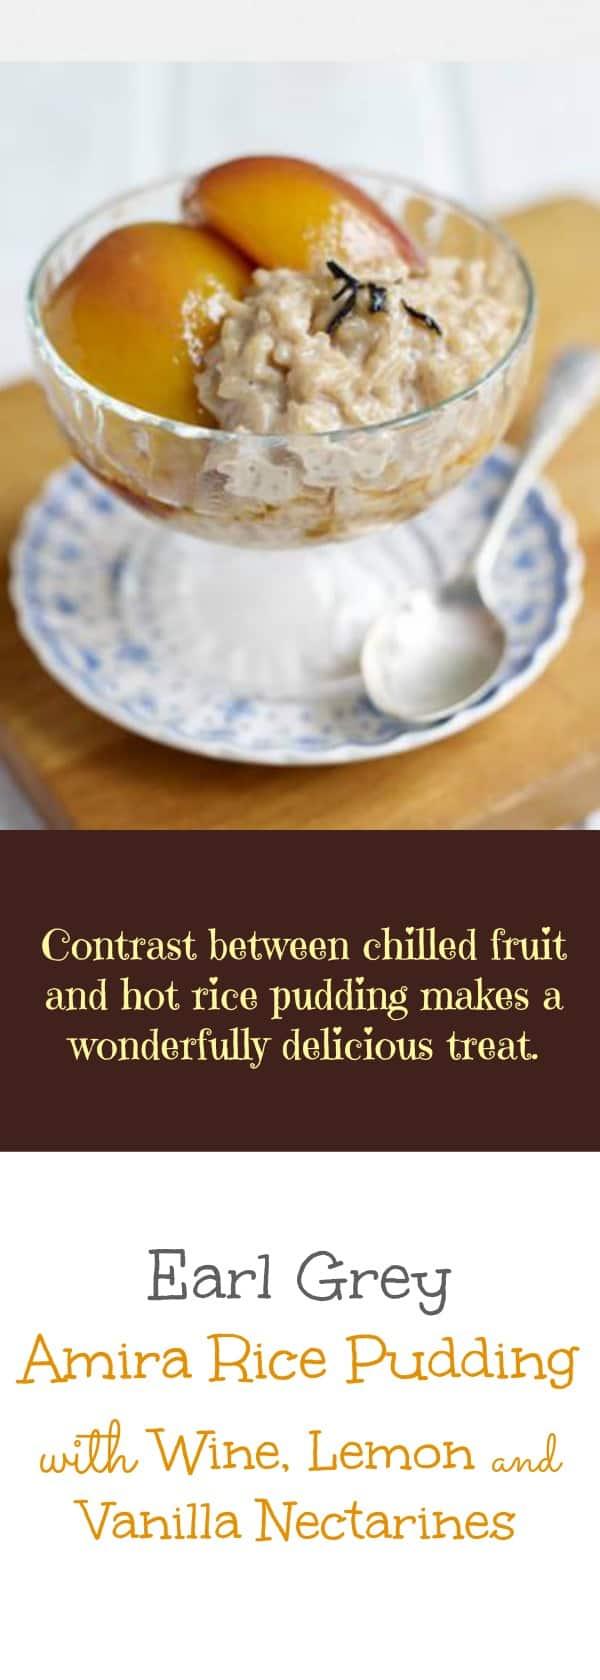 Earl Grey Amira Rice Pudding with Wine, Lemon and Vanilla Nectarines